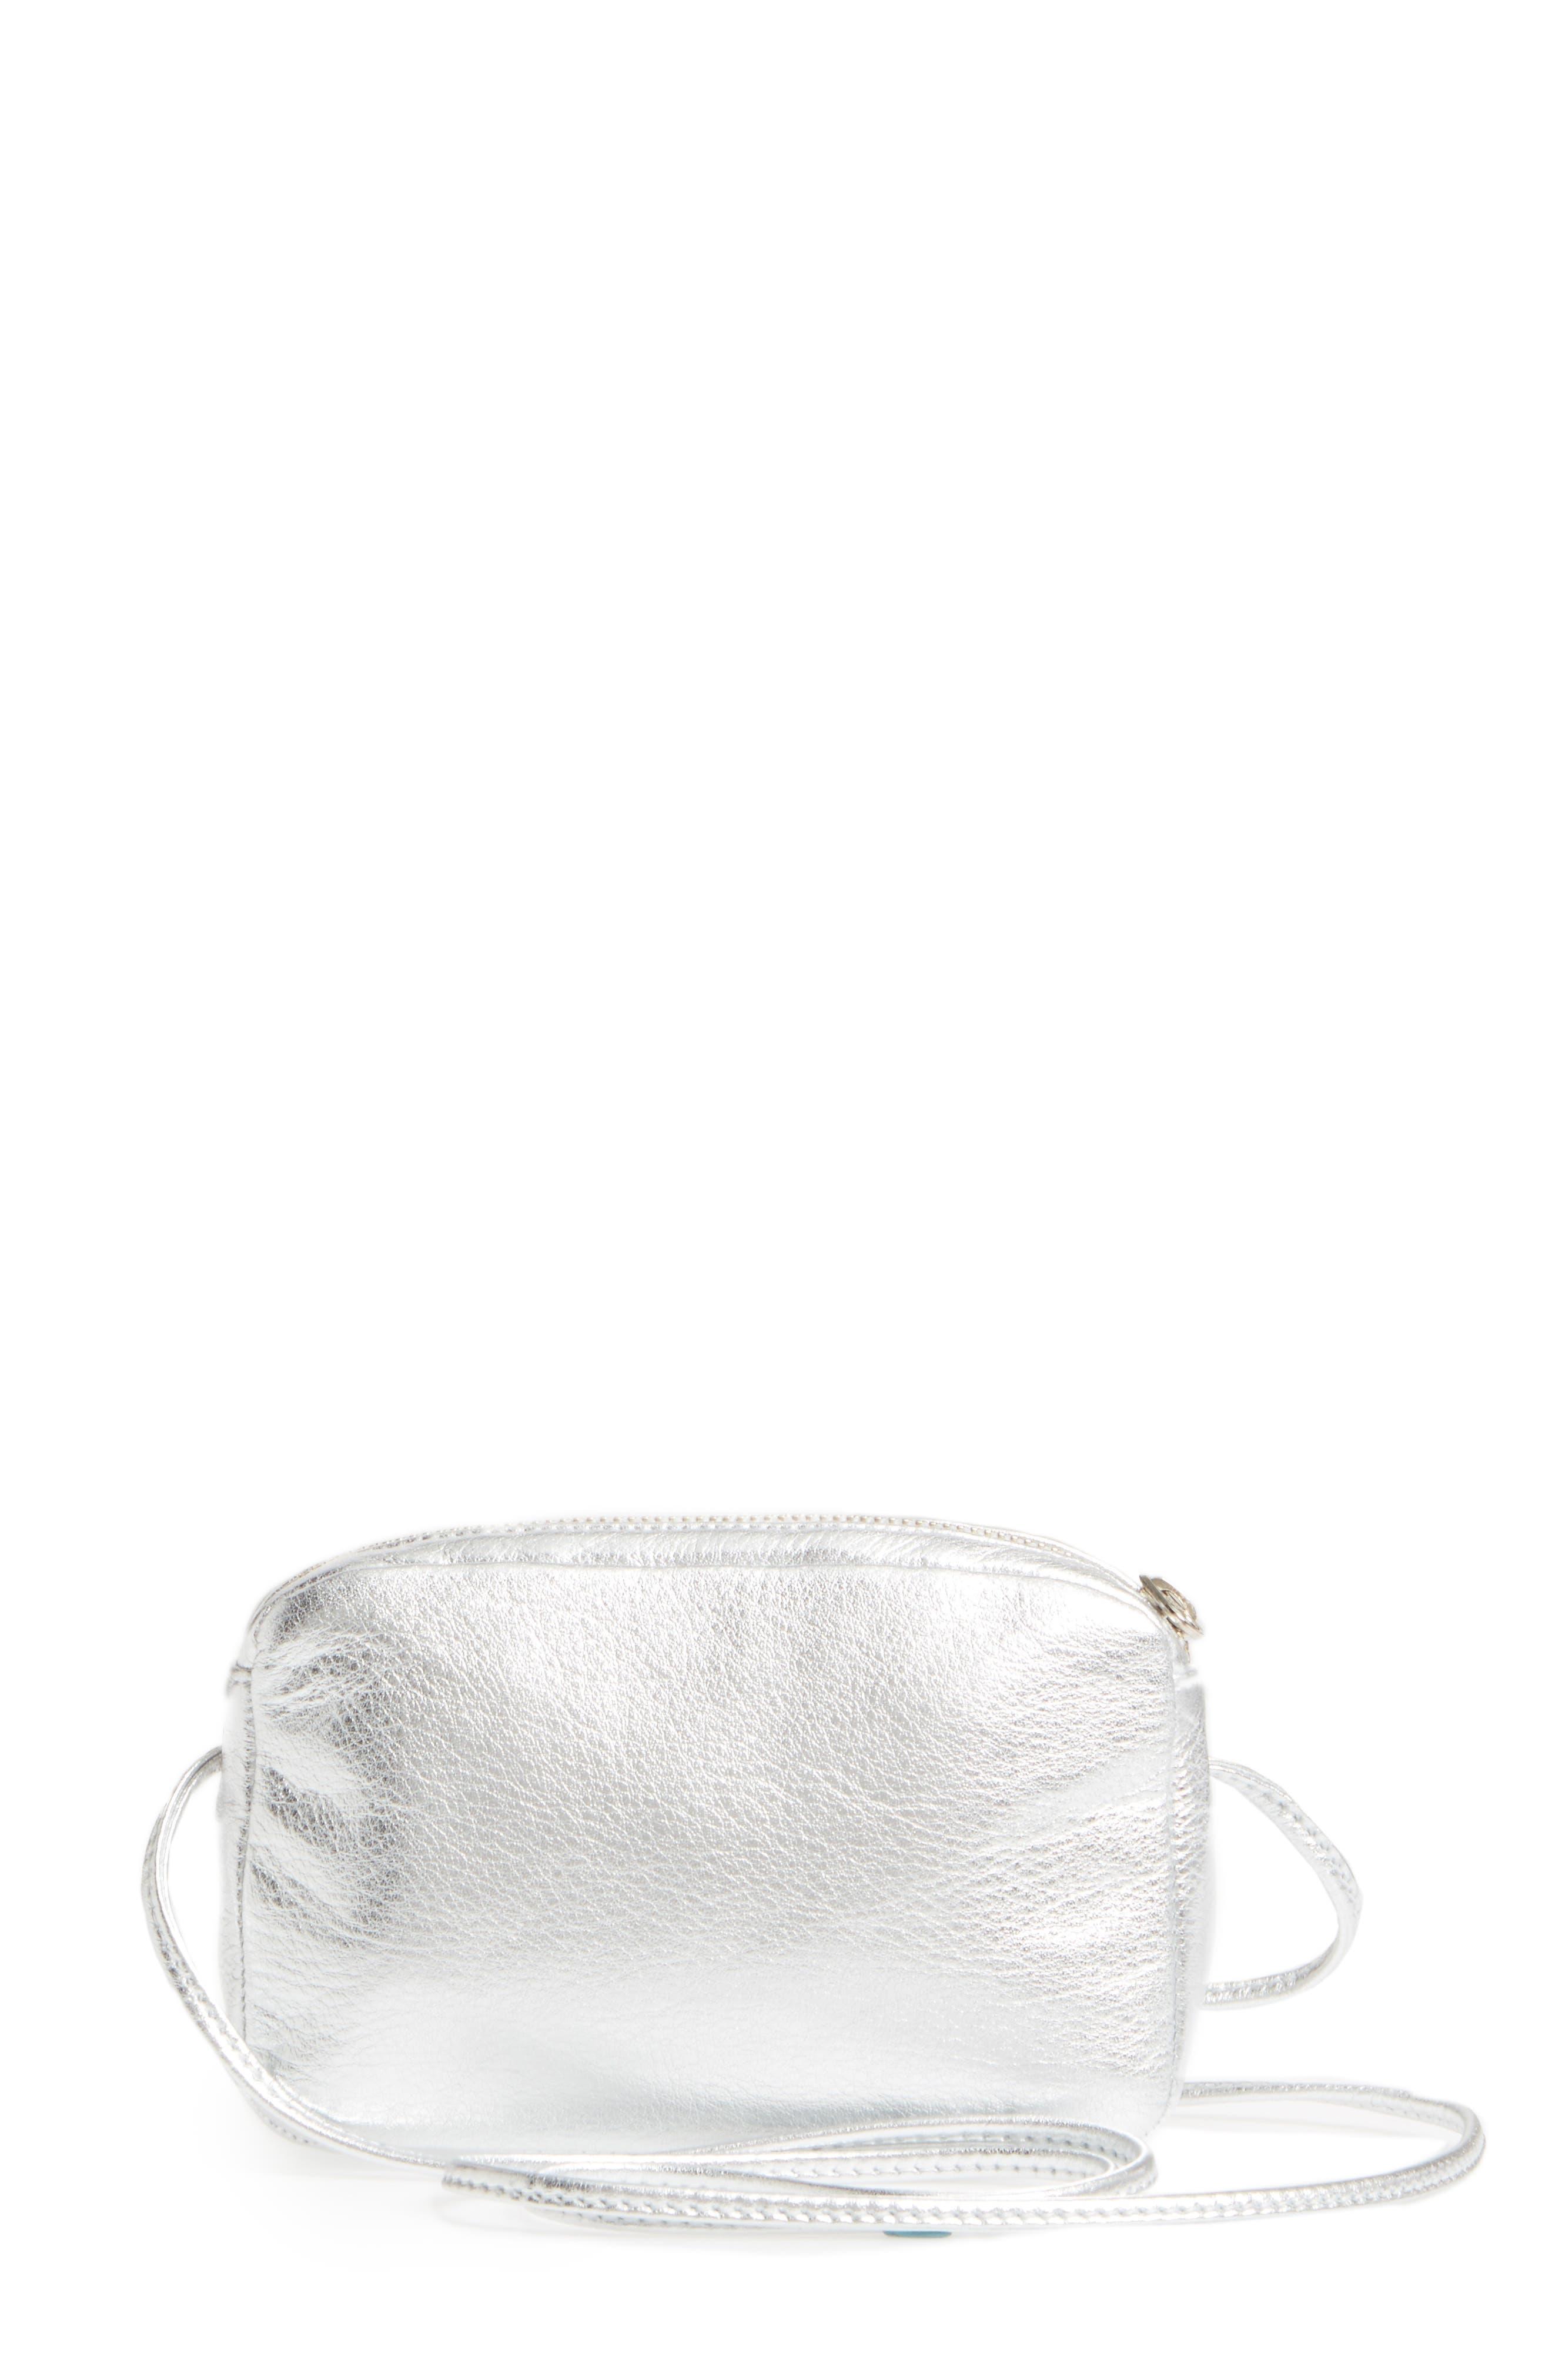 'Mini' Pebbled Leather Crossbody,                             Main thumbnail 1, color,                             Silver